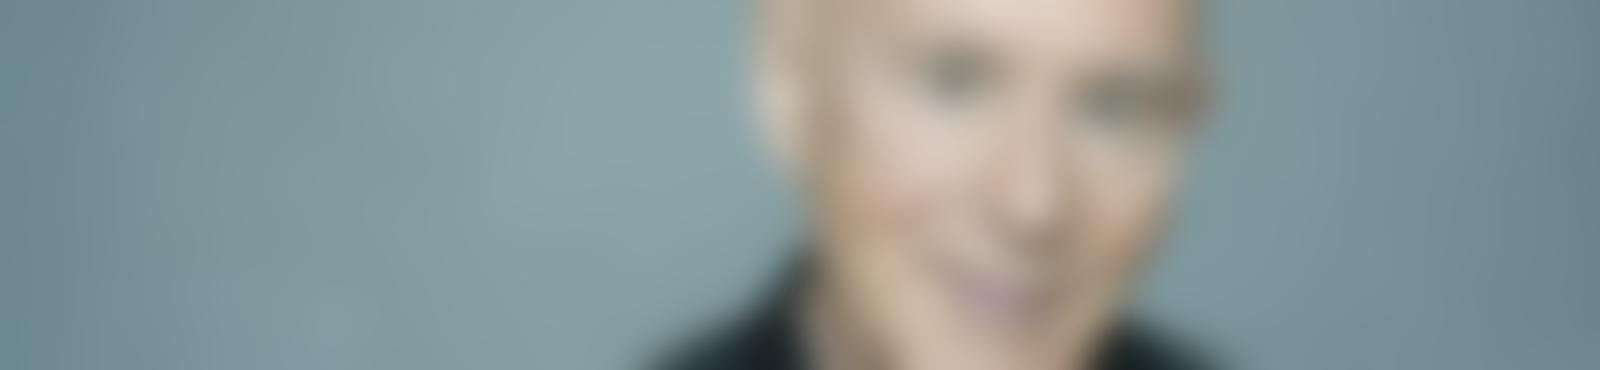 Blurred c71a6ec3 87f8 4525 bbe3 557a76ee1d8b